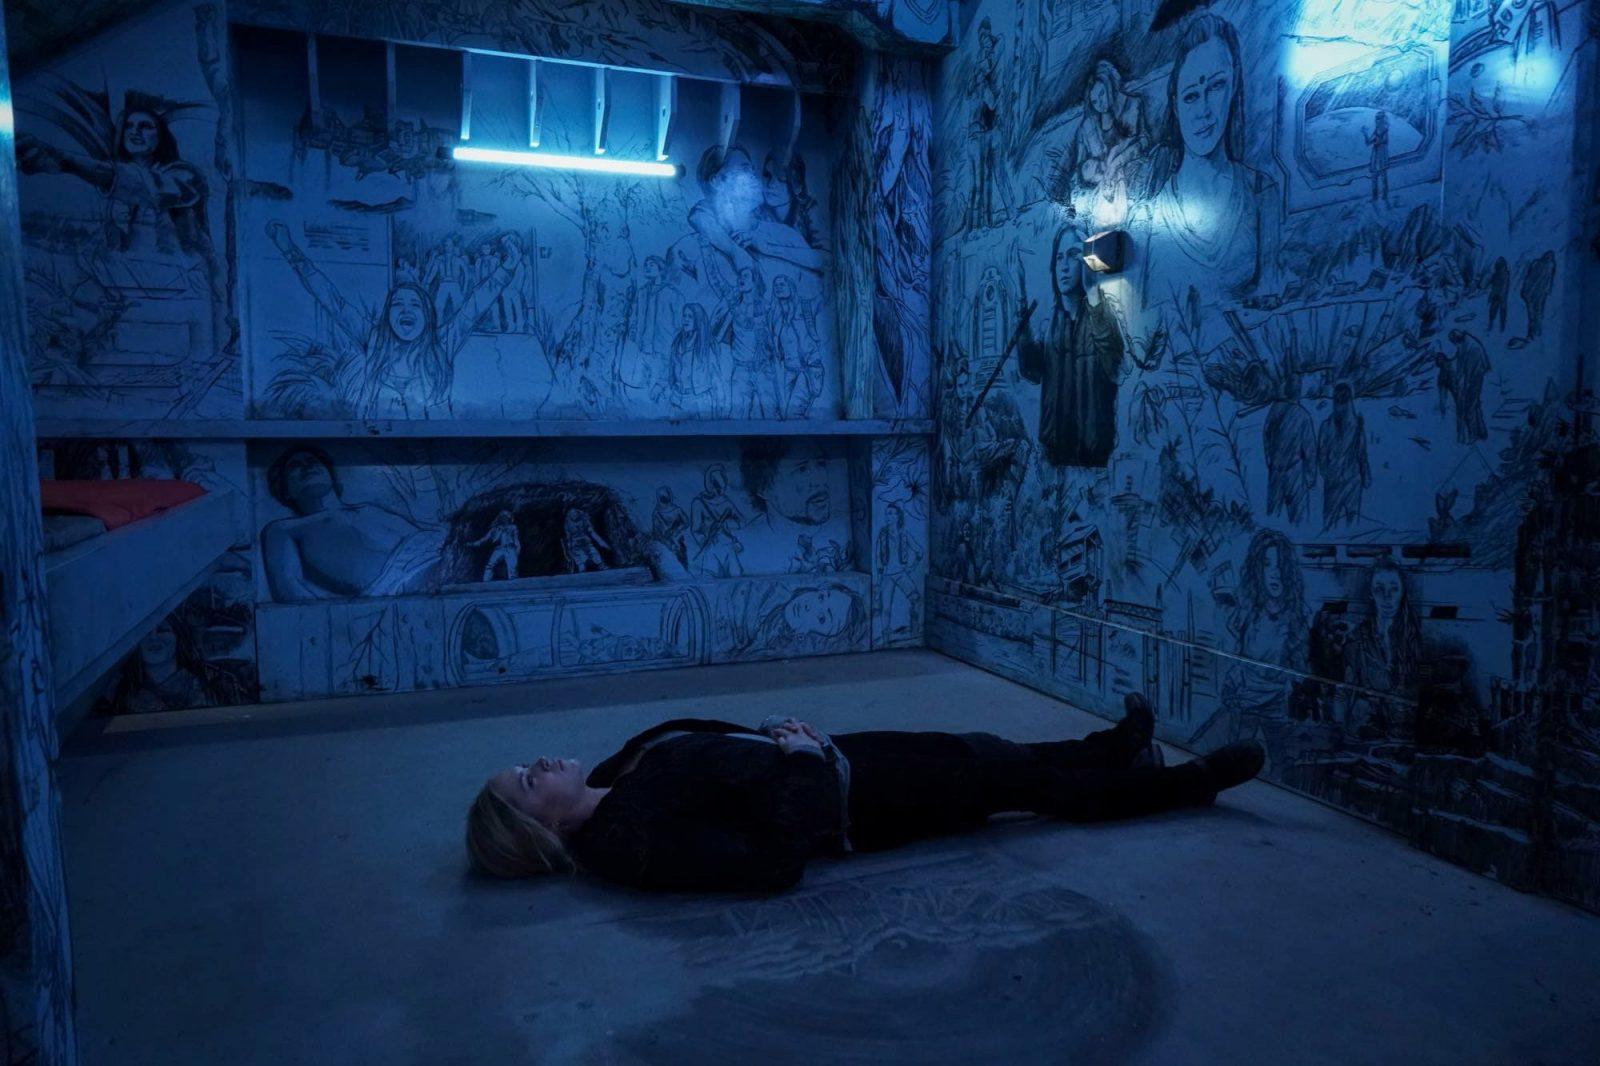 Eliza Taylor como Clarke en The 100 Temporada 6 Episodio 8 The Old Man and the Anomaly